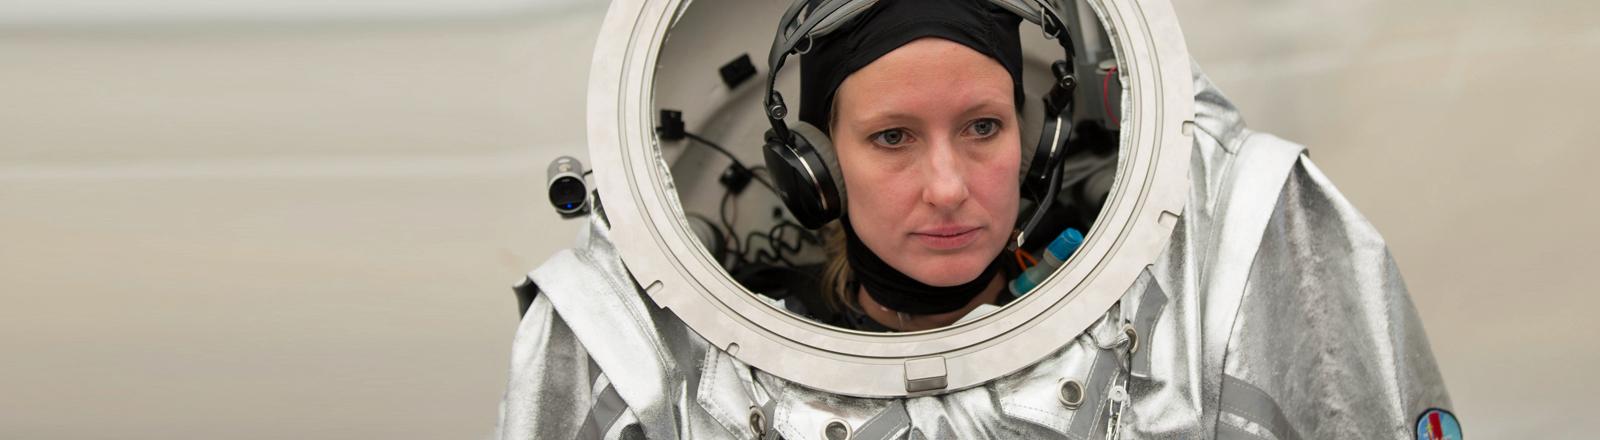 Carmen Köhler in ihrem Raumanzug am 3. August 2015 während der Mars-Simulation Amadee-15.